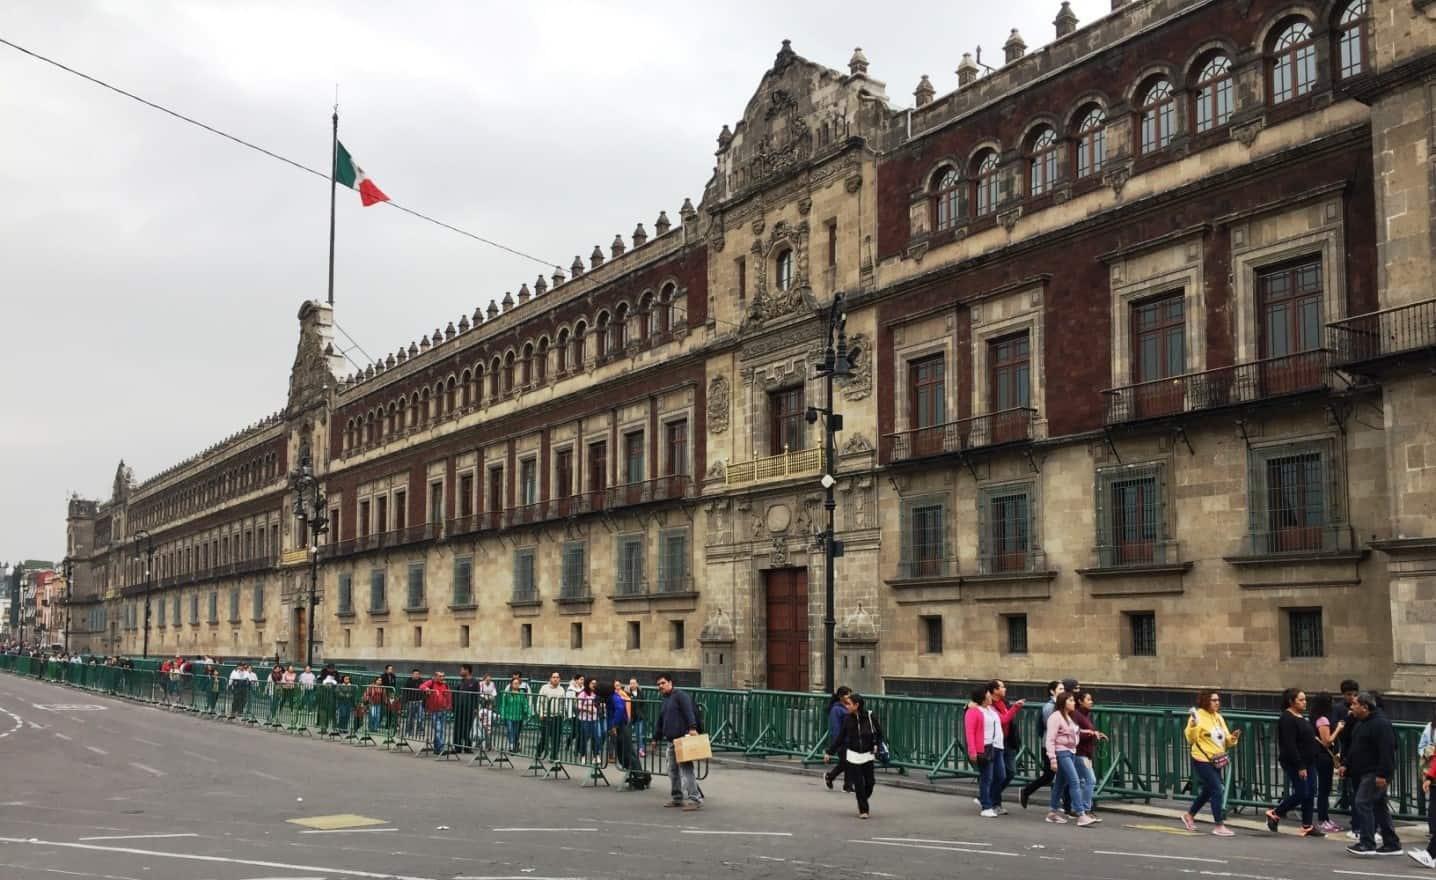 Palacio Nacional building - A very full first day in Mexico City